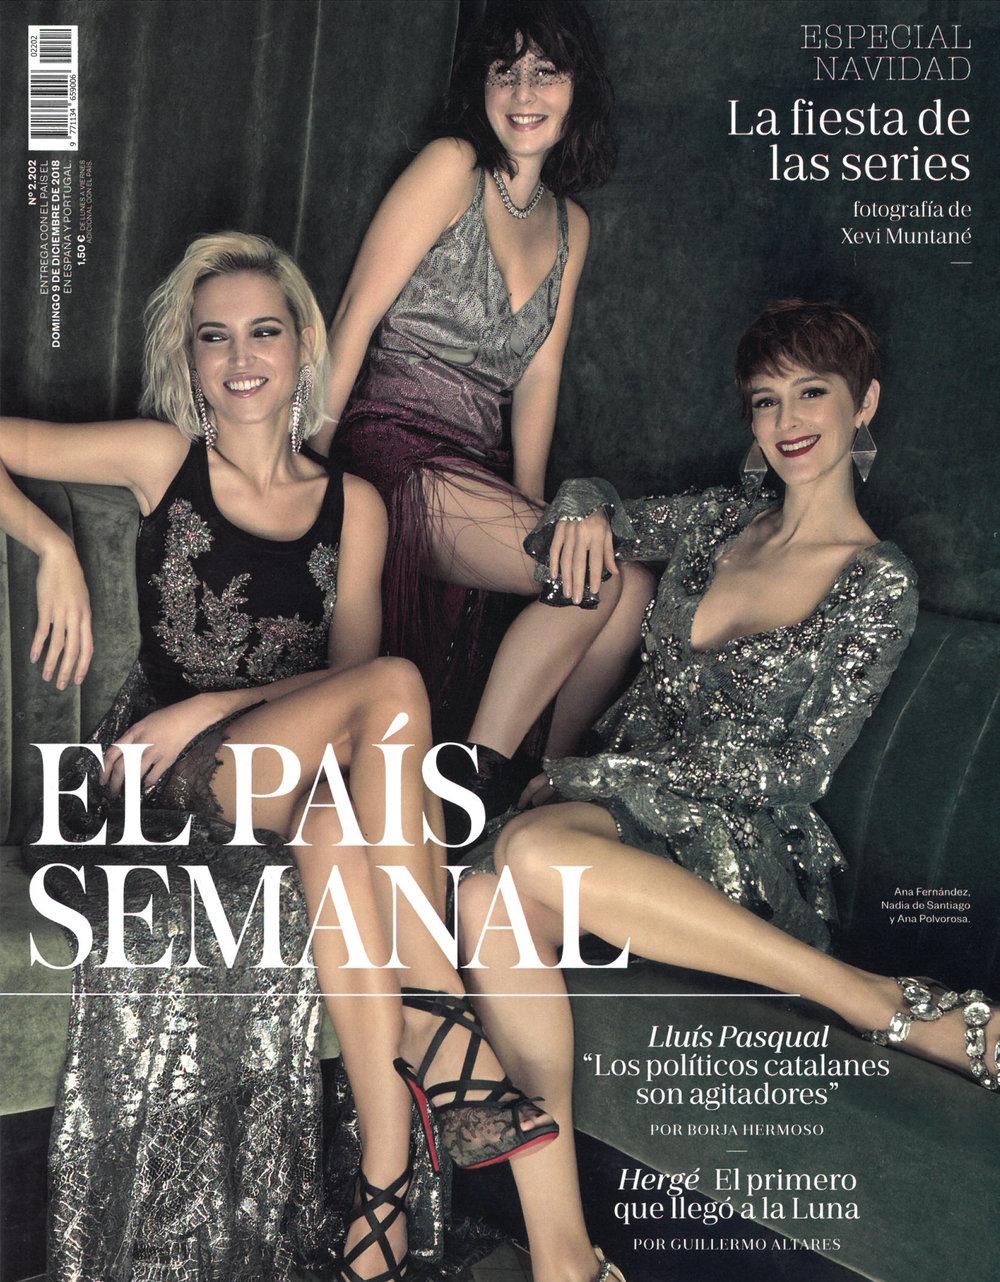 SPAIN_ElPaisSemanal_9_12_18_portada.jpg